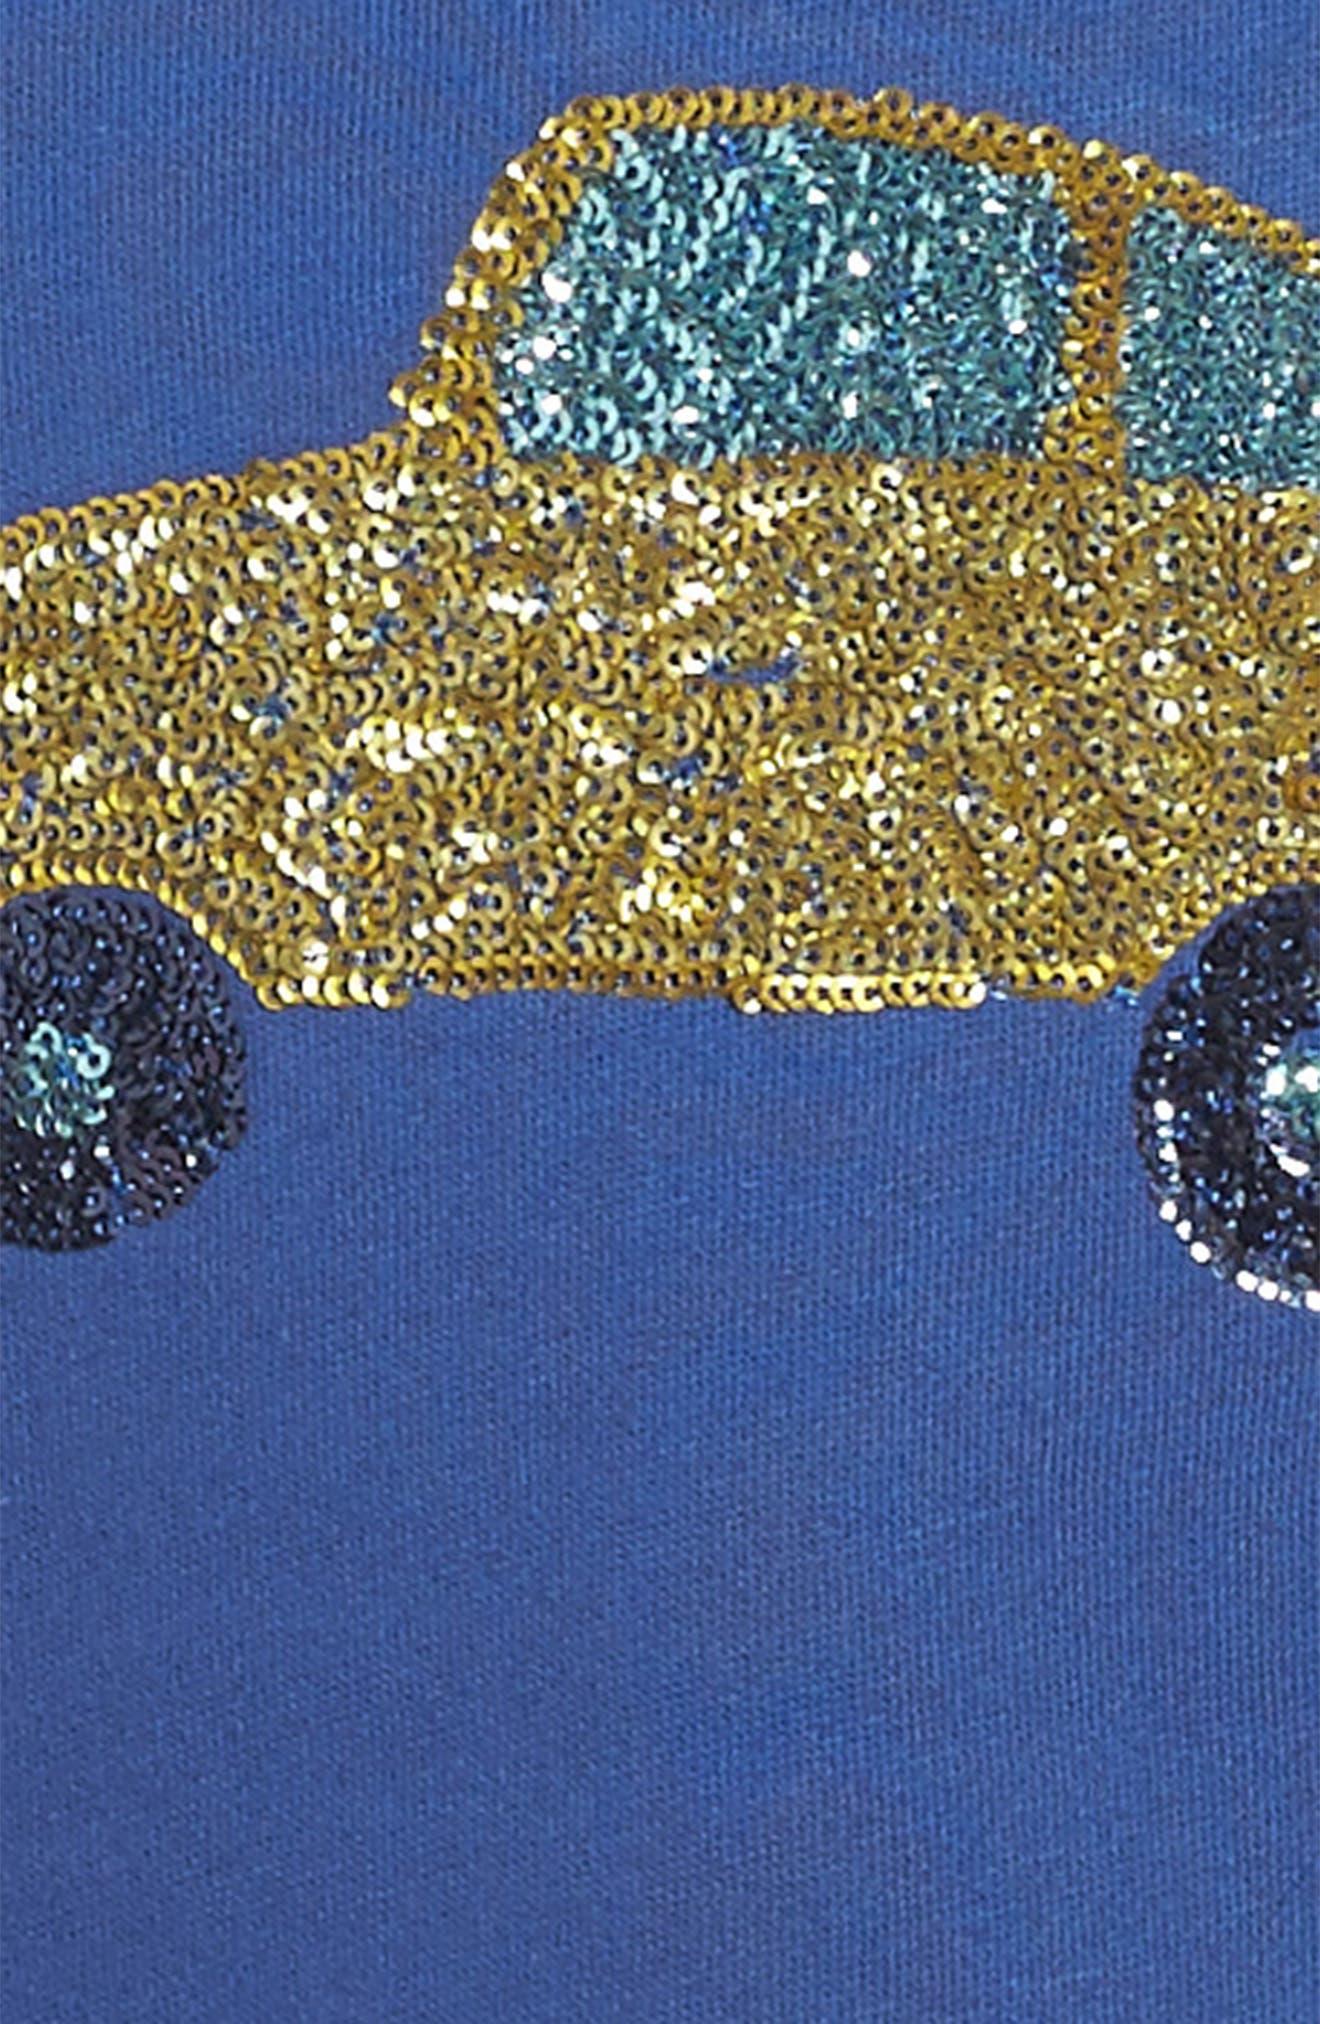 Alternate Image 3  - Mini Boden Sequin Appliqué Dress (Toddler Girls, Little Girls & Big Girls)